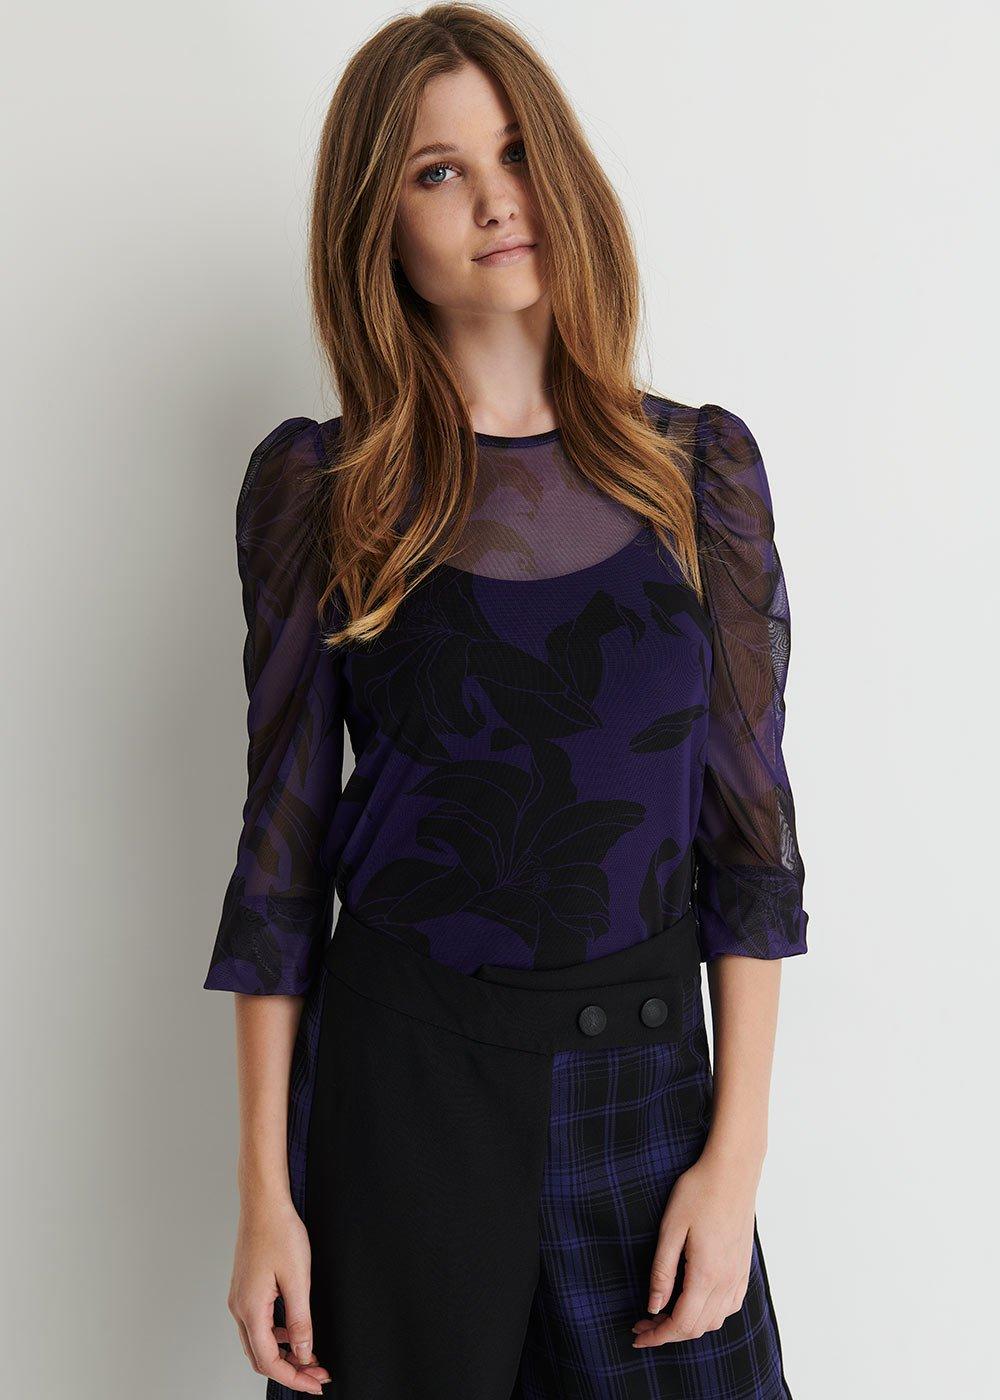 Samuela Printed T-shirt in Tulle - Black/Violet/Fantasia - Woman